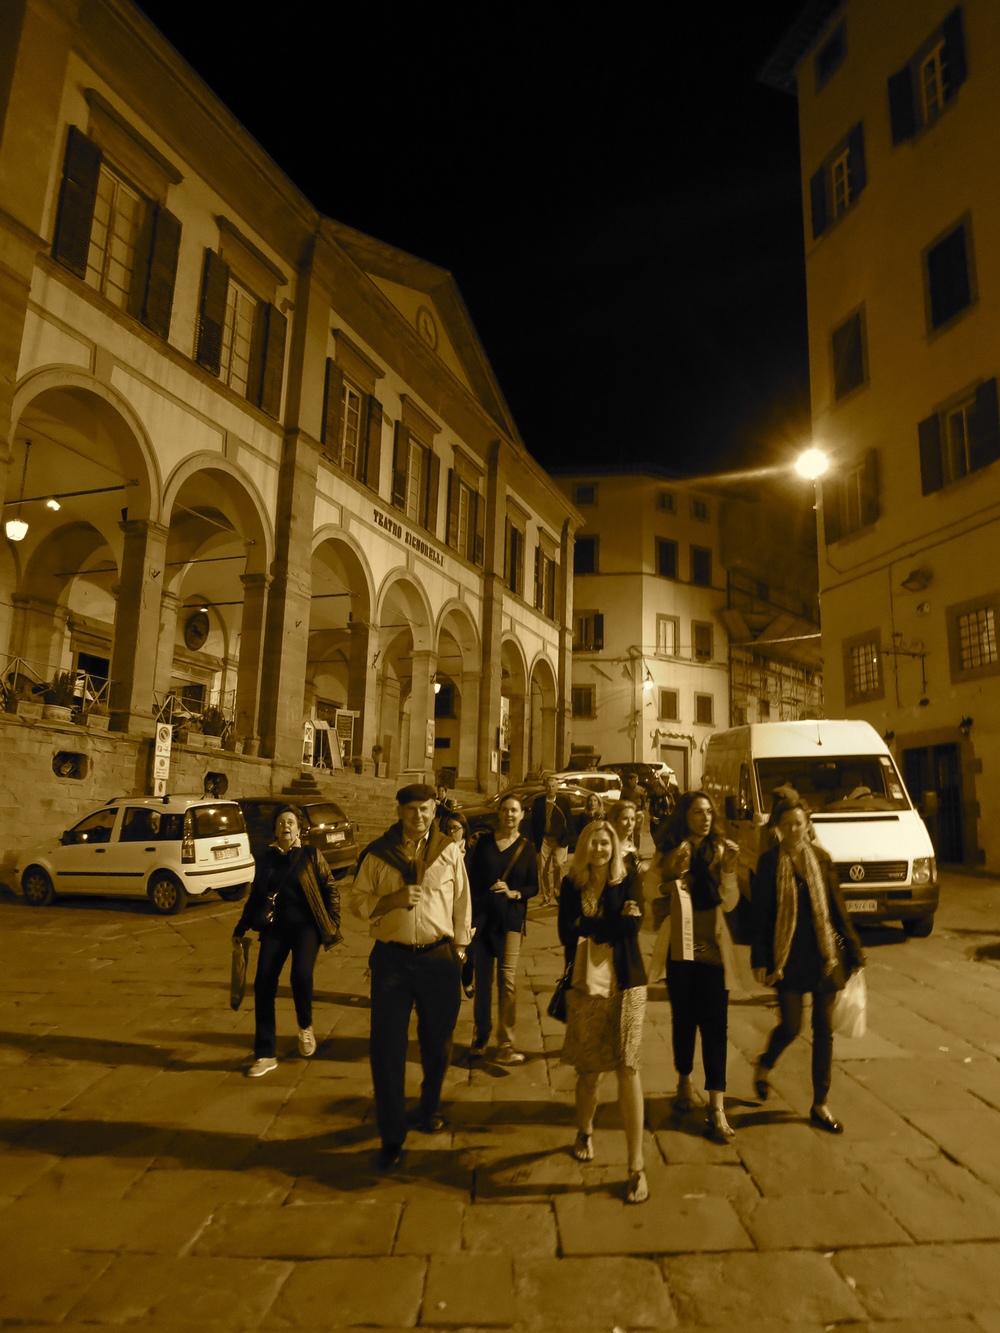 An evening in Cortona.